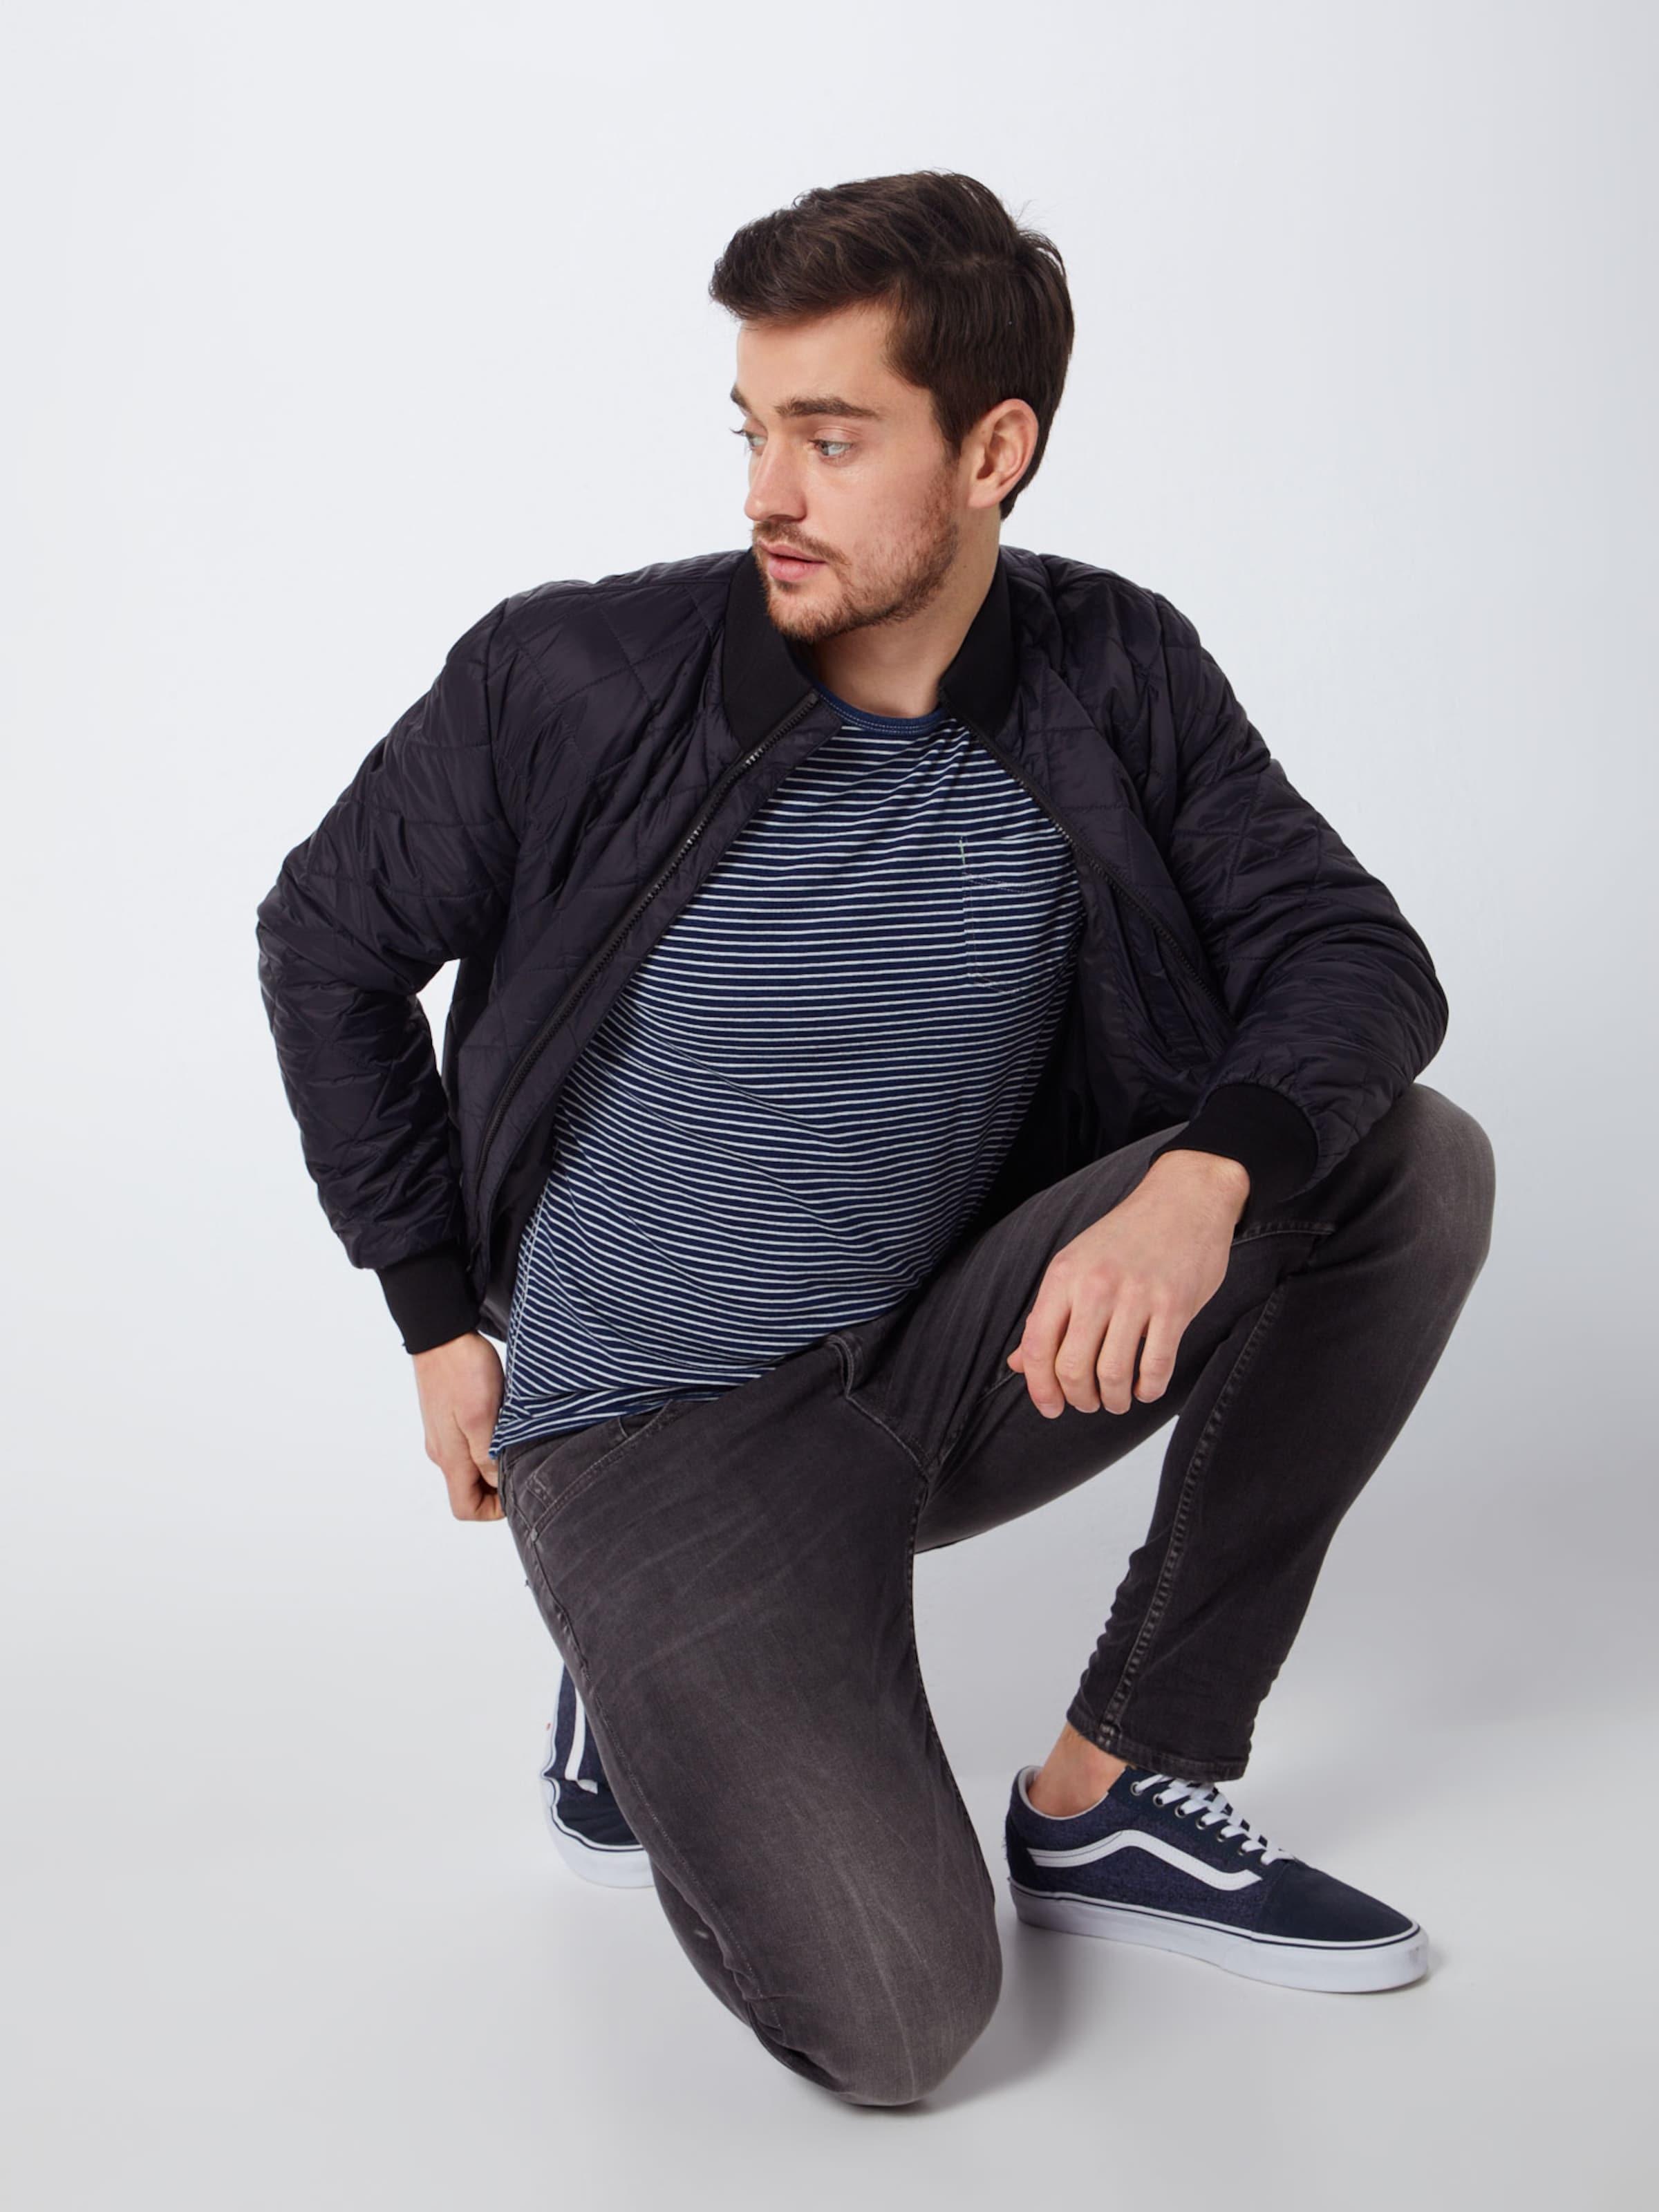 HellblauWeiß Shirt 'denby' Pepe In Jeans 54RLAj